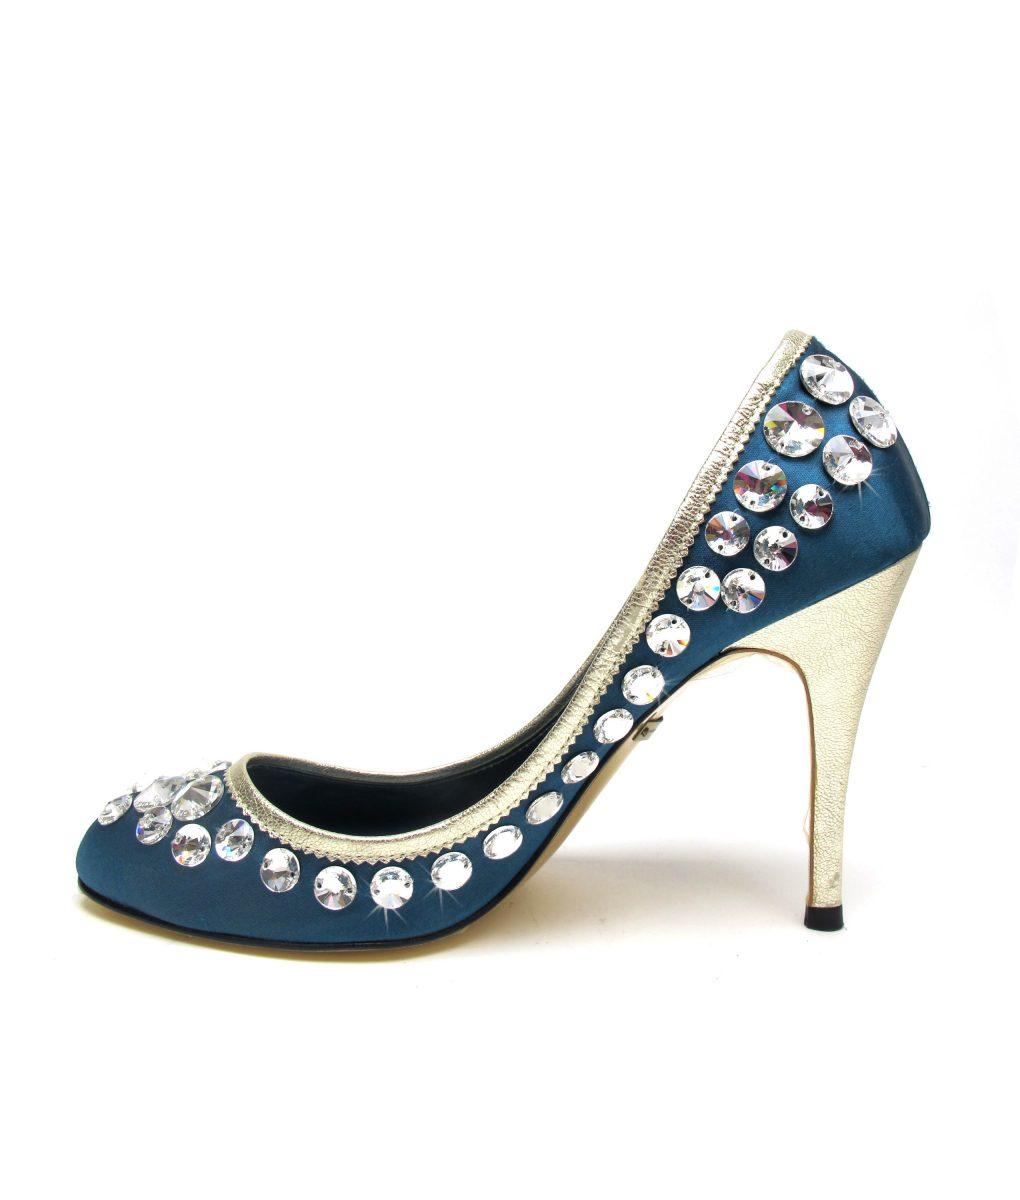 Suecomma Bonnie Teal Swarovski Crystal heels